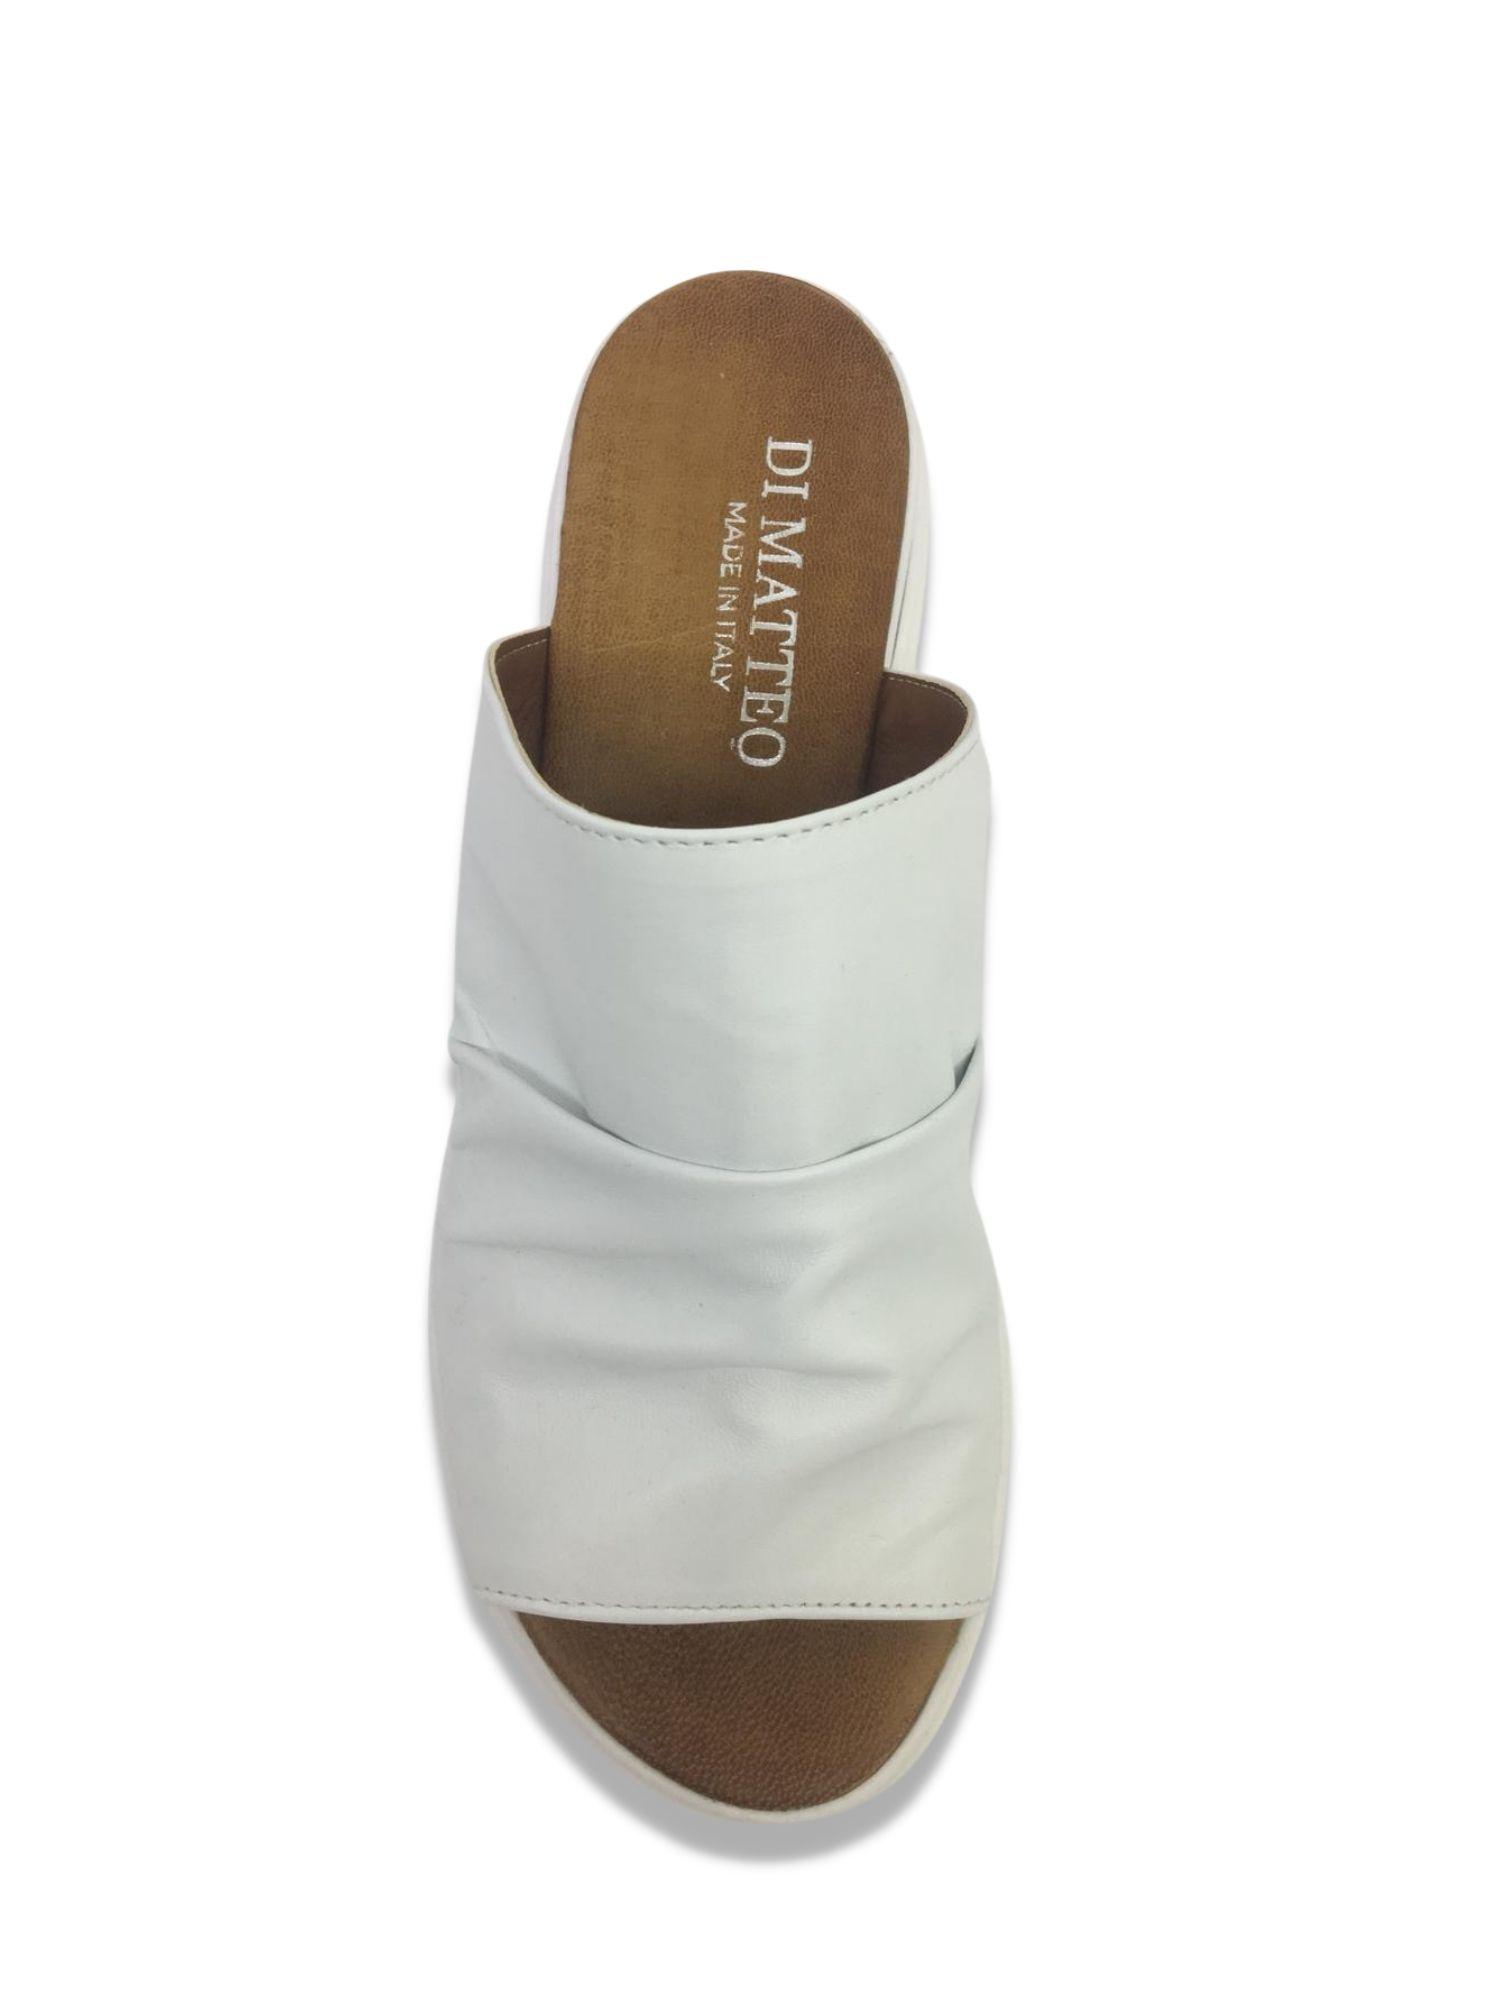 Sandalo Sabot Made in Italy 404 Bianco alto 1